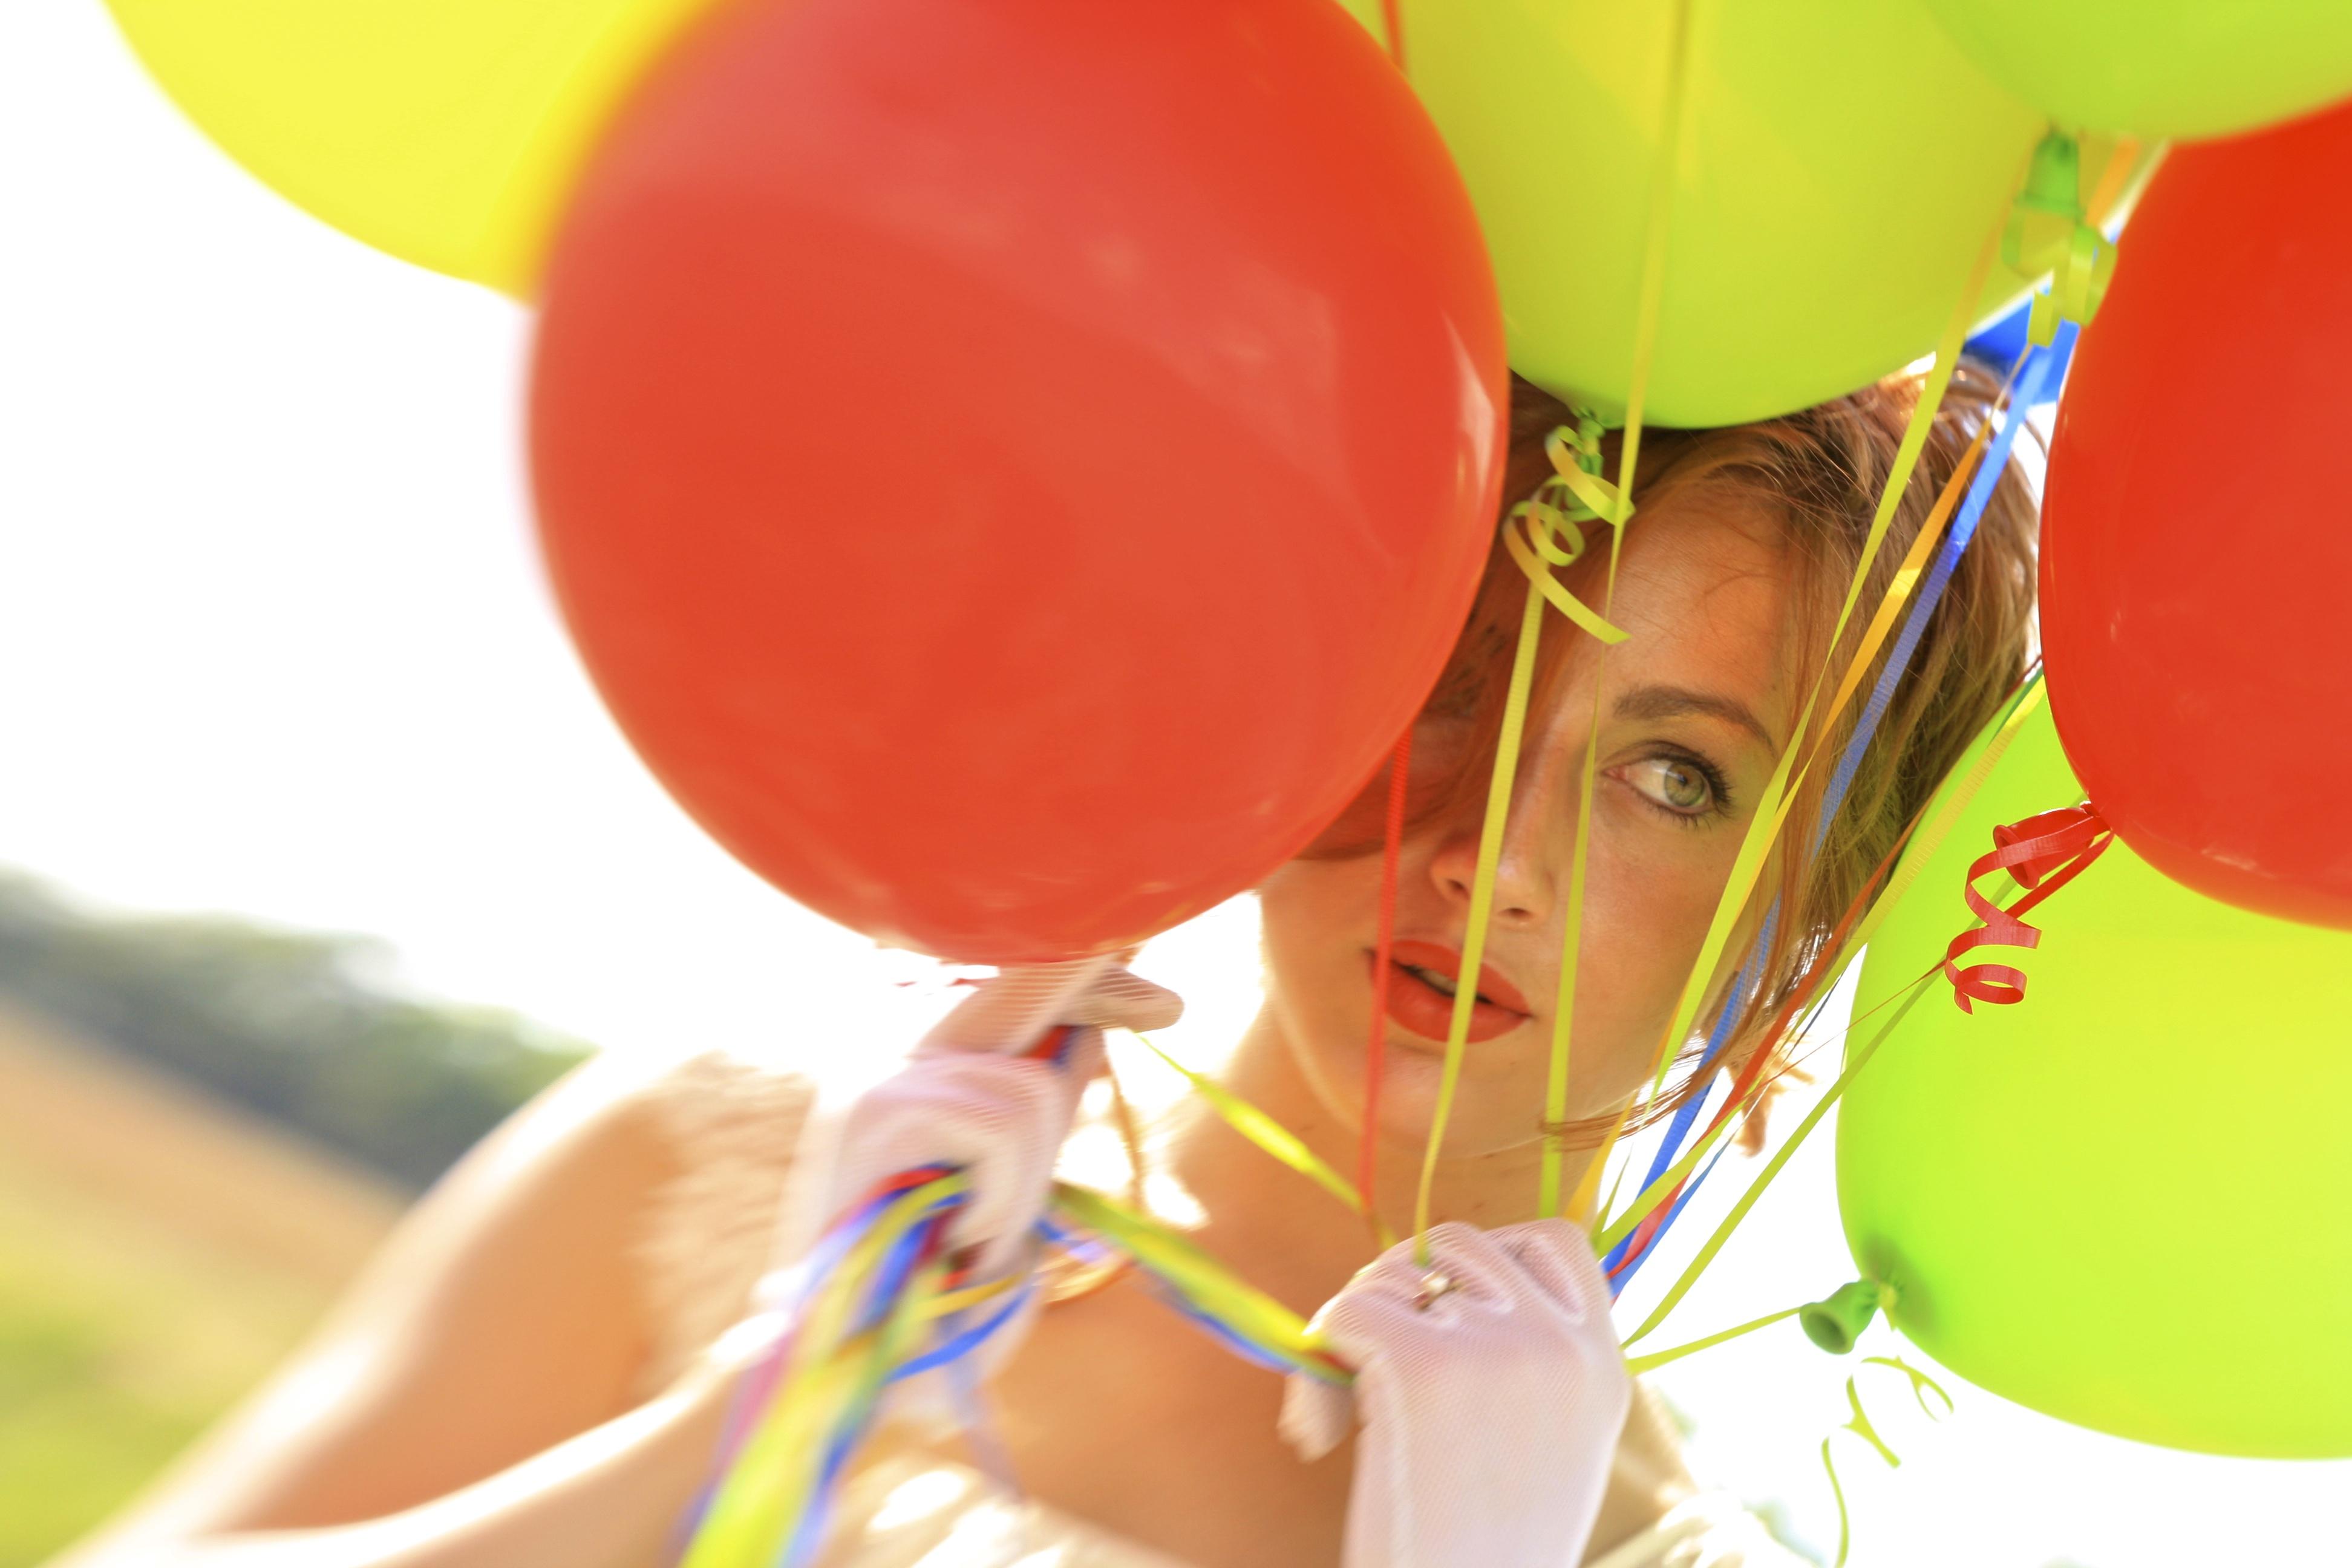 Kate's Balloons